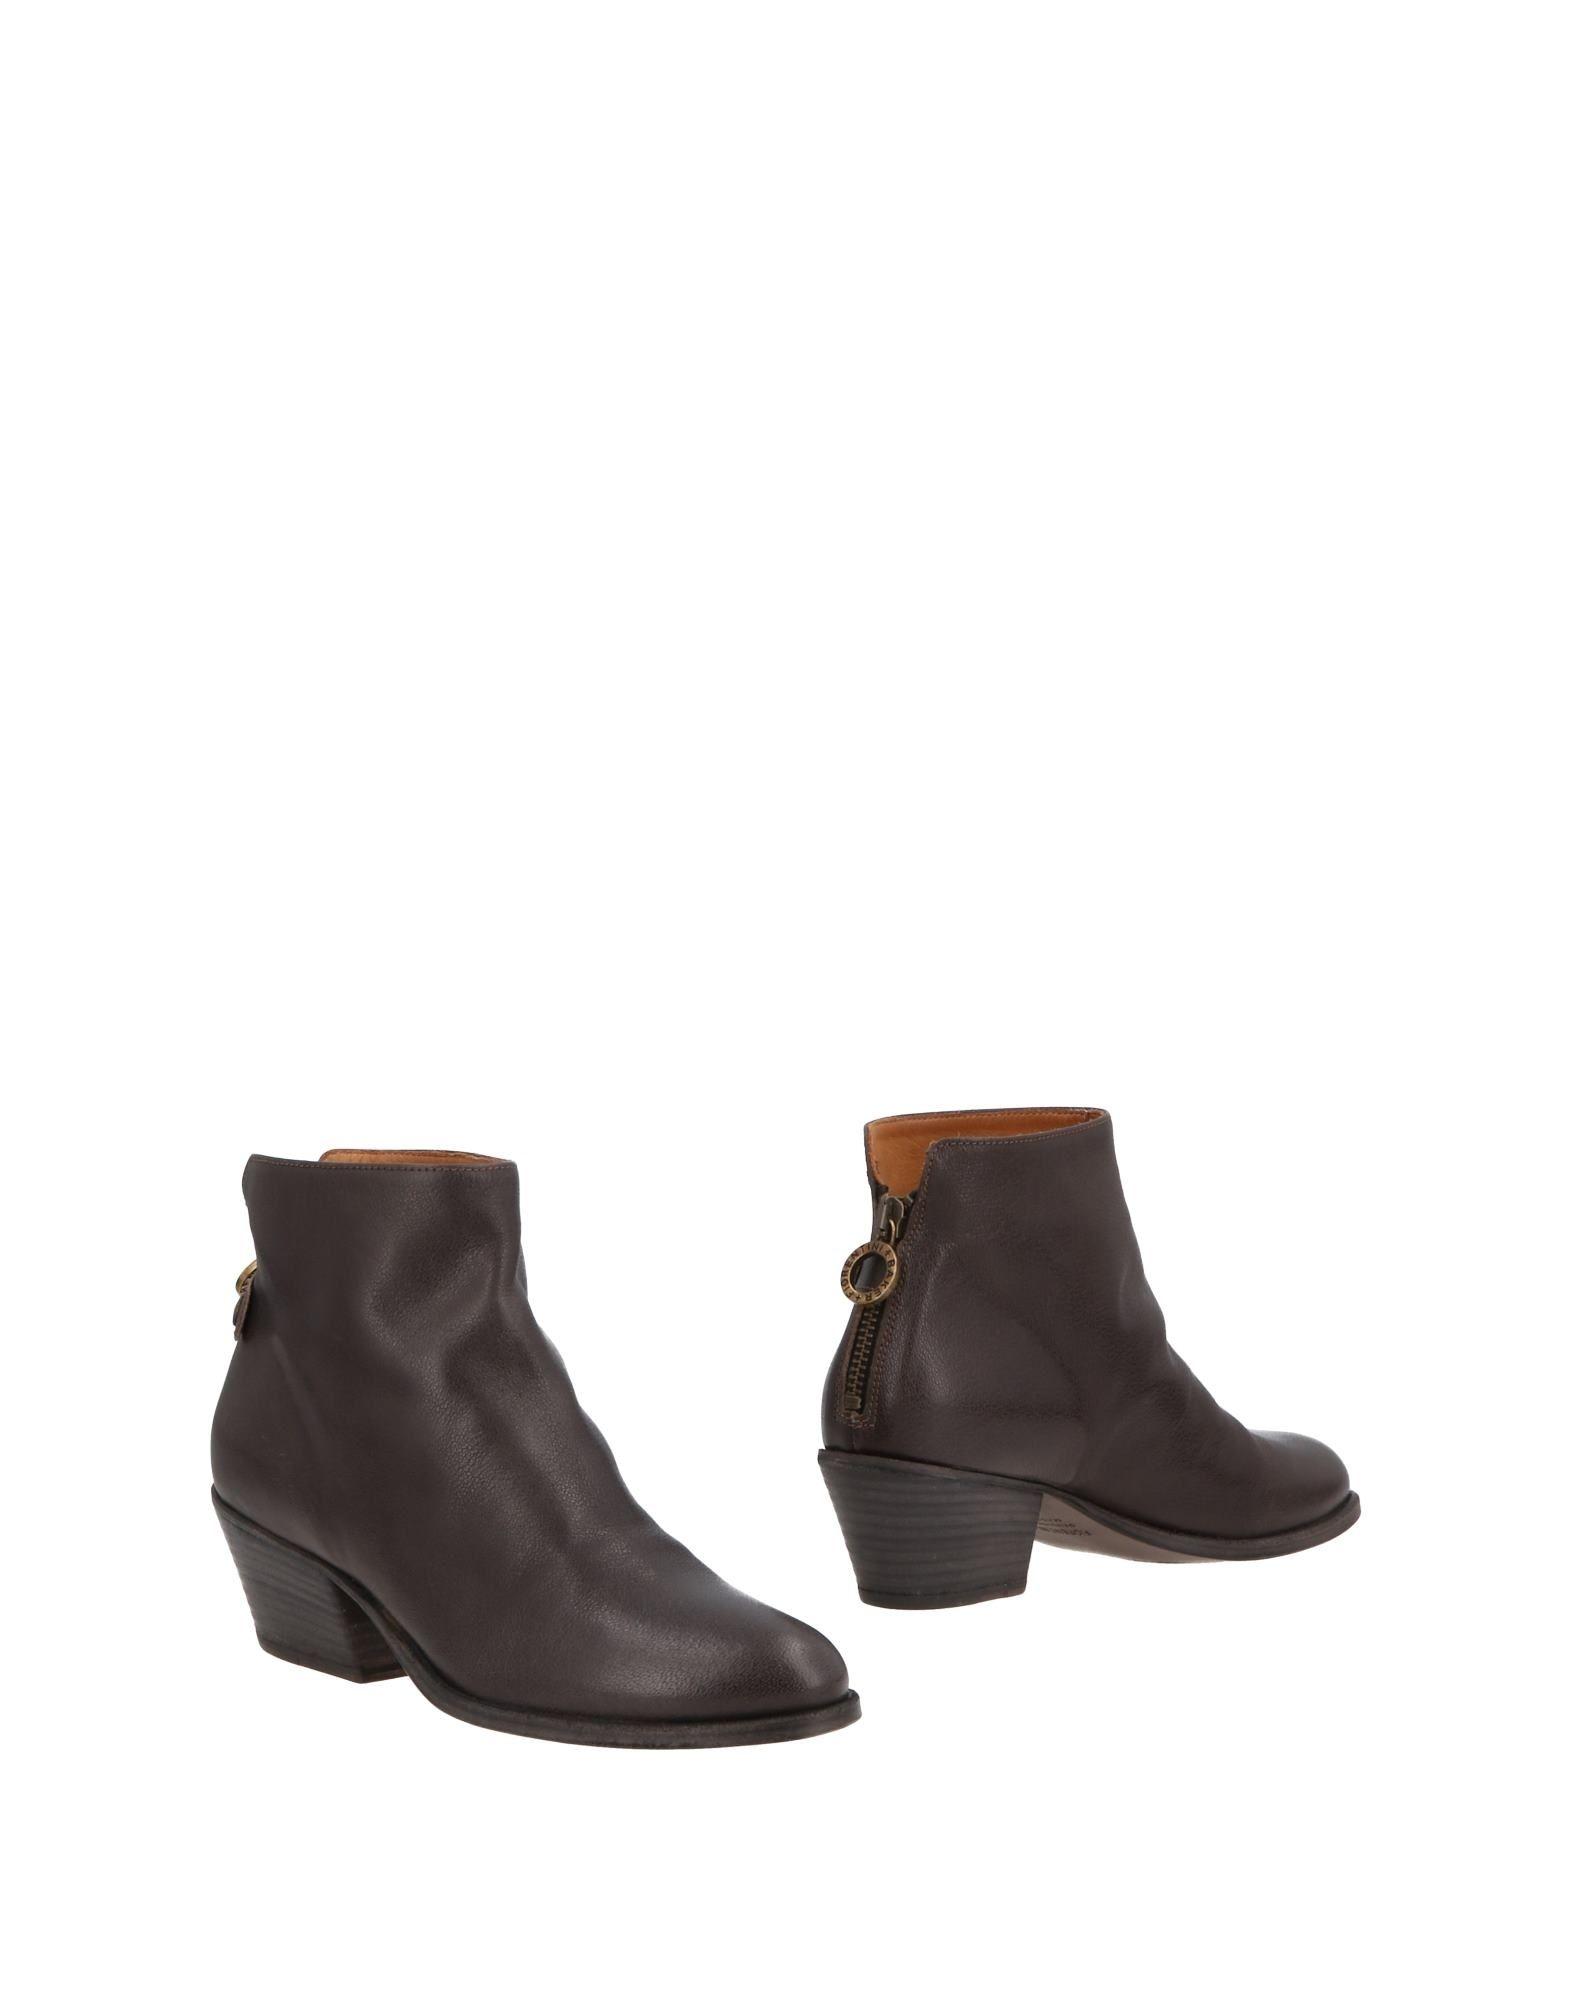 Stilvolle billige Schuhe Fiorentini+Baker  Stiefelette Damen  Fiorentini+Baker 11499514XQ cad8a5